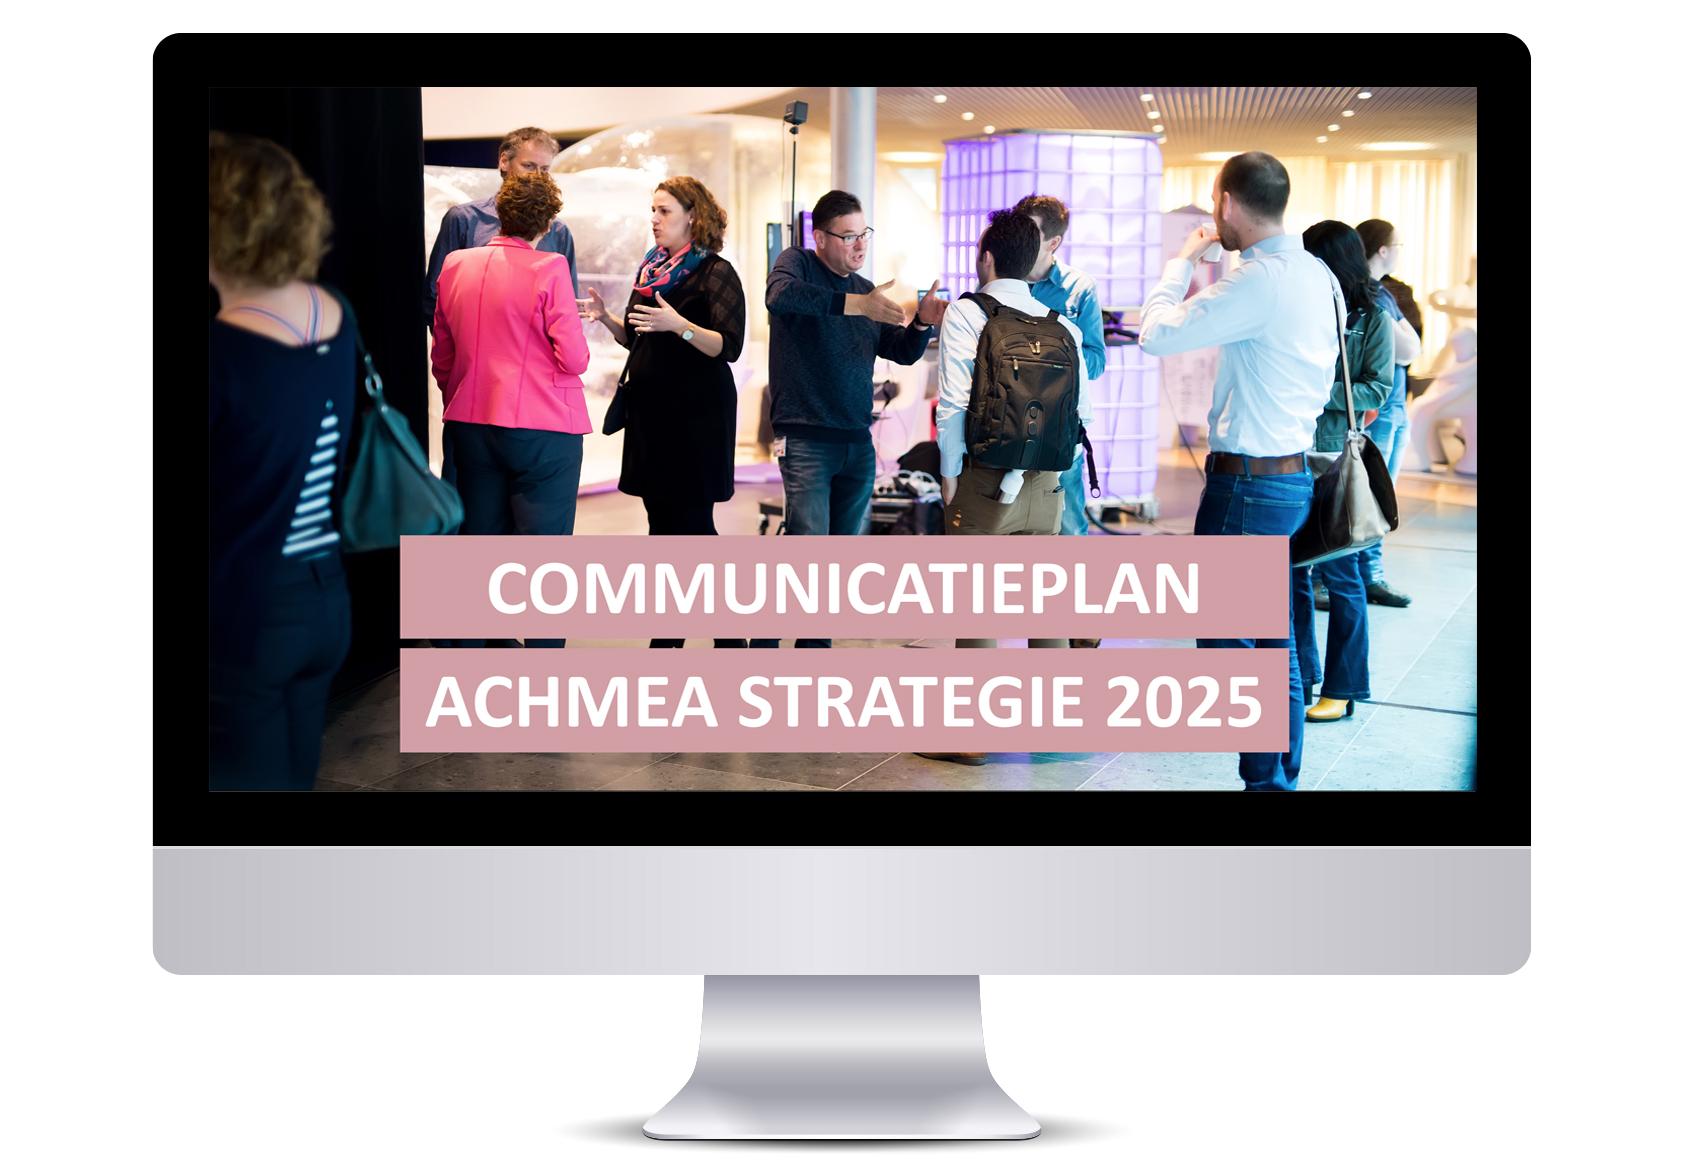 https://margowestgeest.nl/wp-content/uploads/2020/05/Communicatiestrategie.jpg